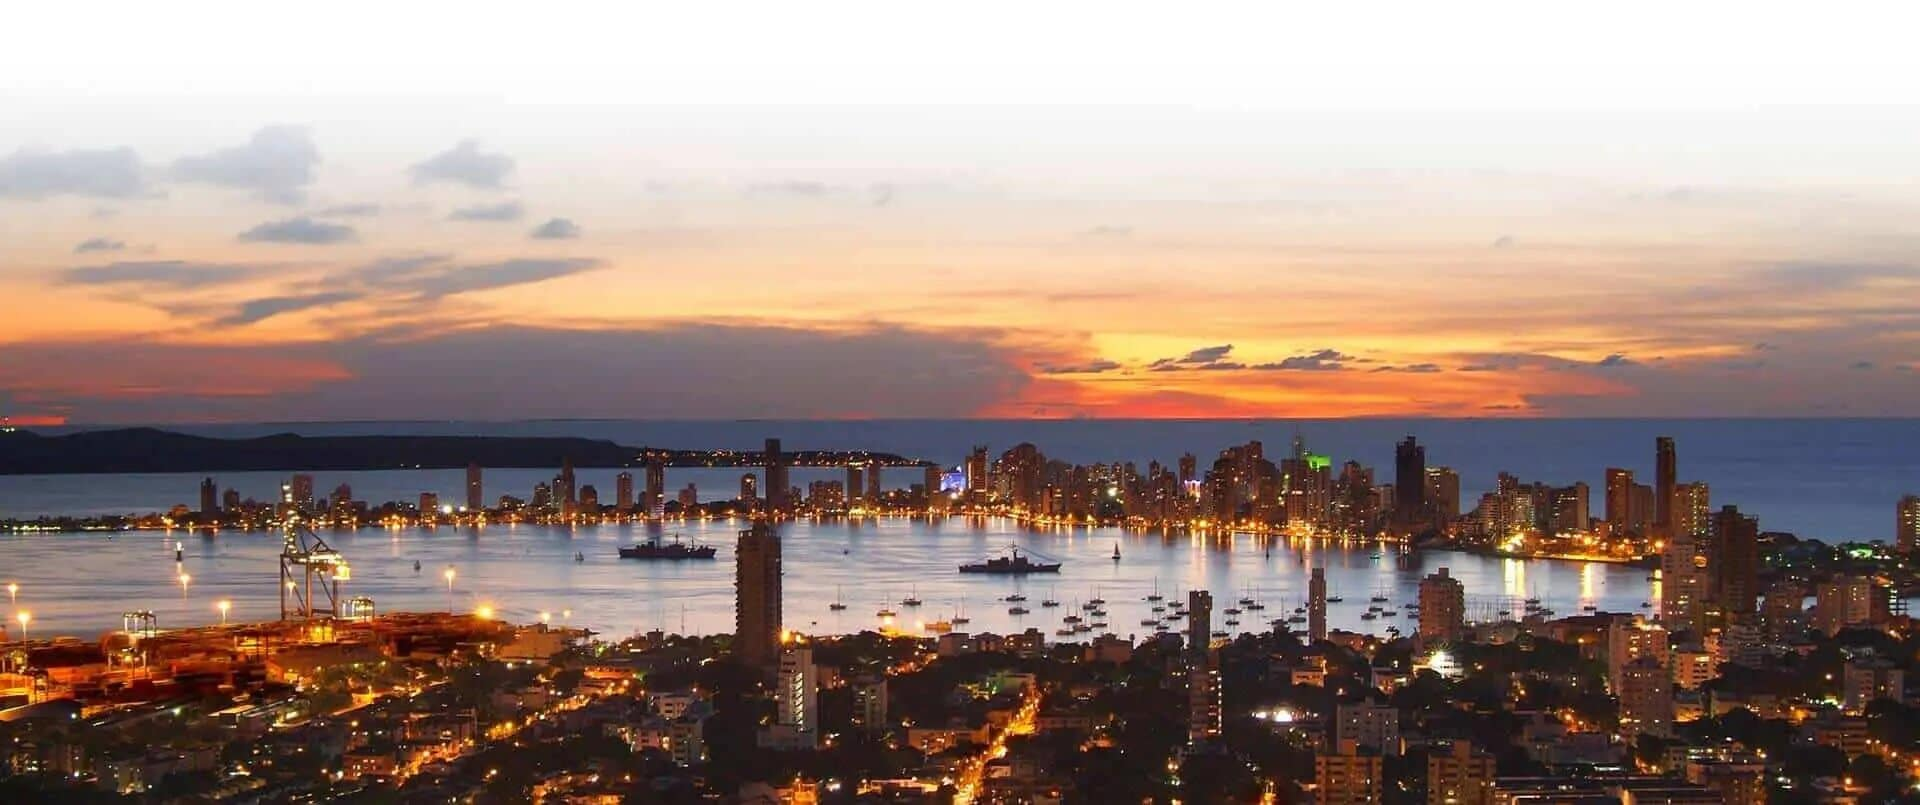 cartagena colombia cityscape at night